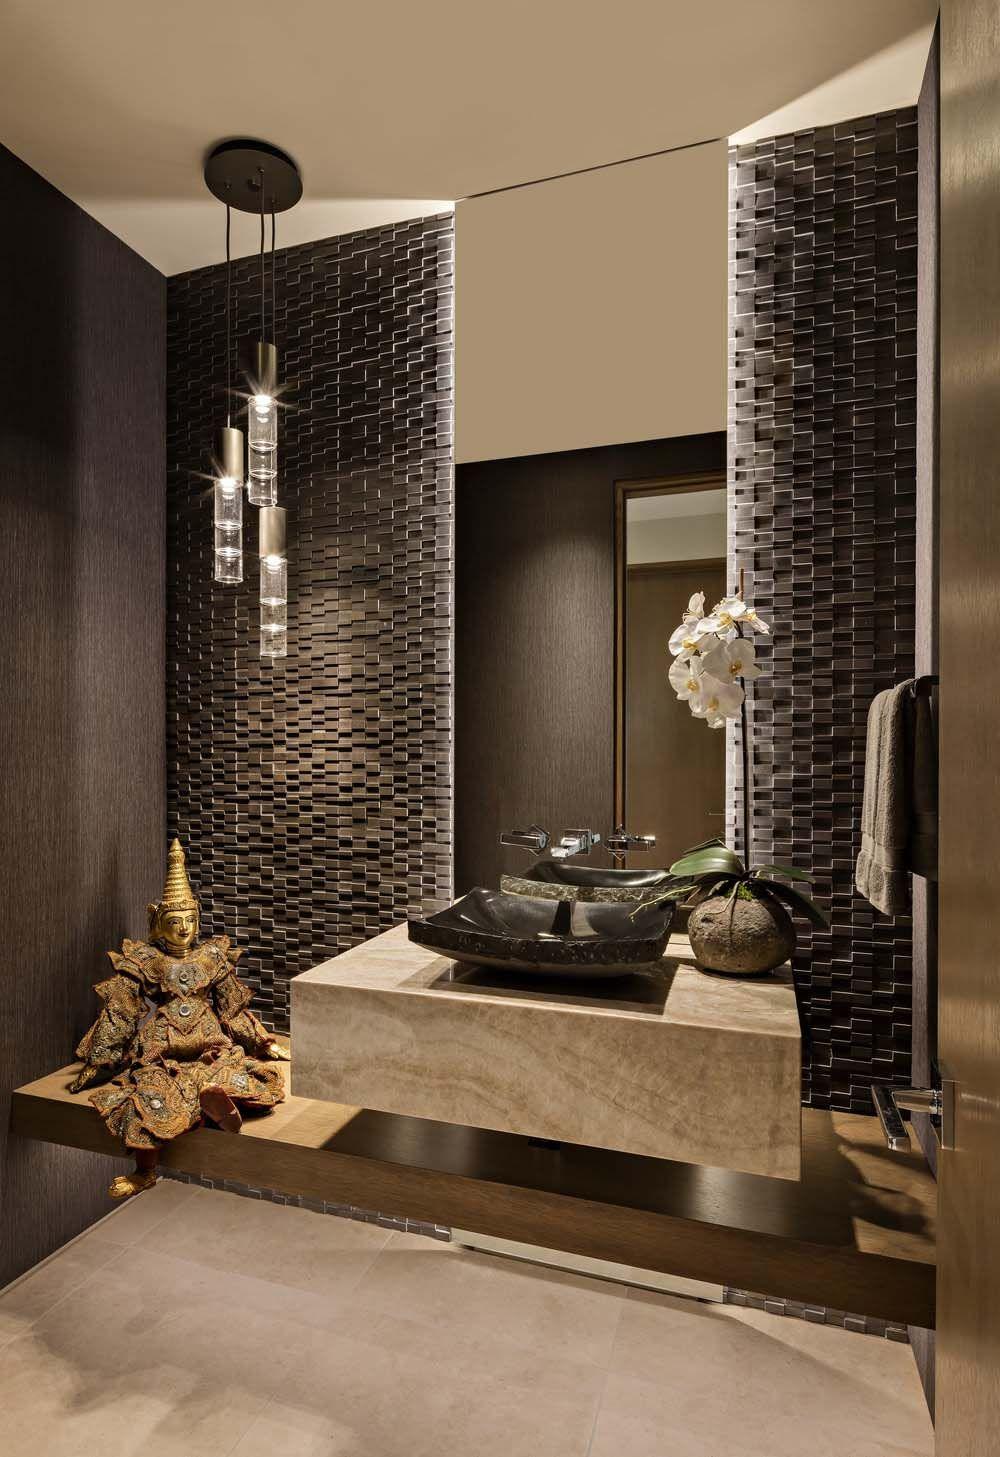 Sensational contemporary desert home blurring indooroutdoor